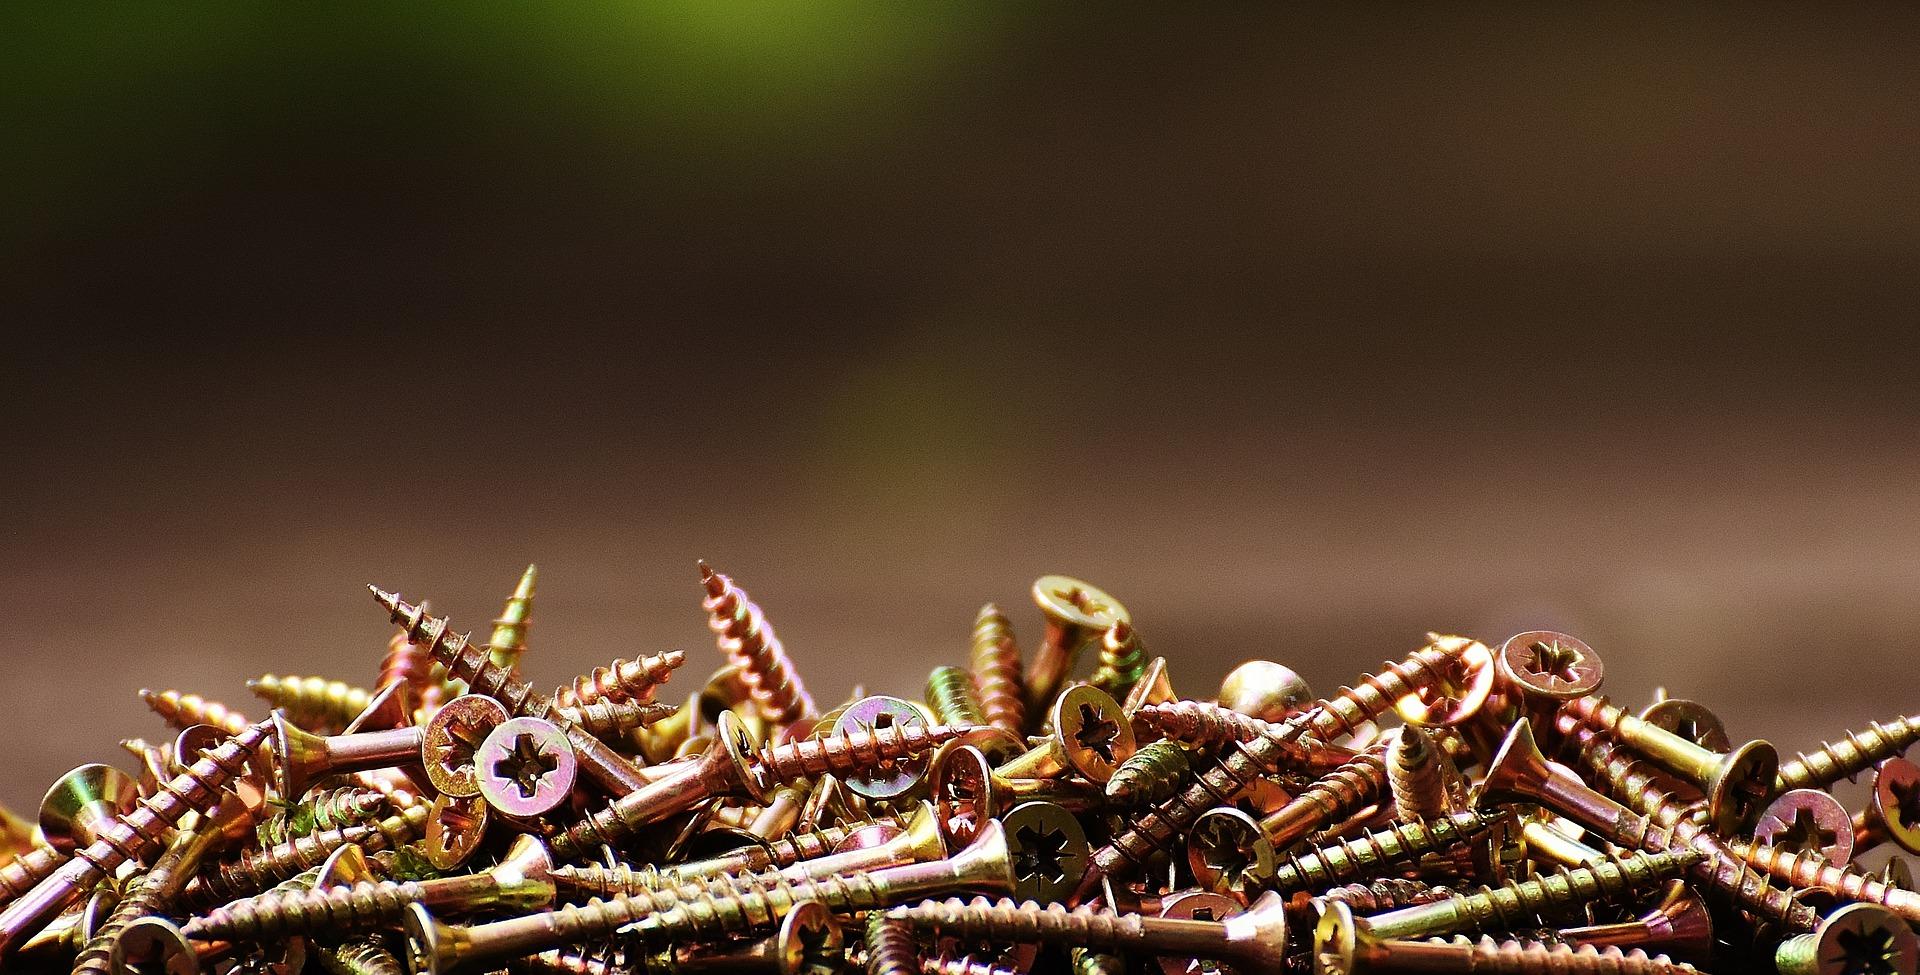 Threaded Fasteners - Screws